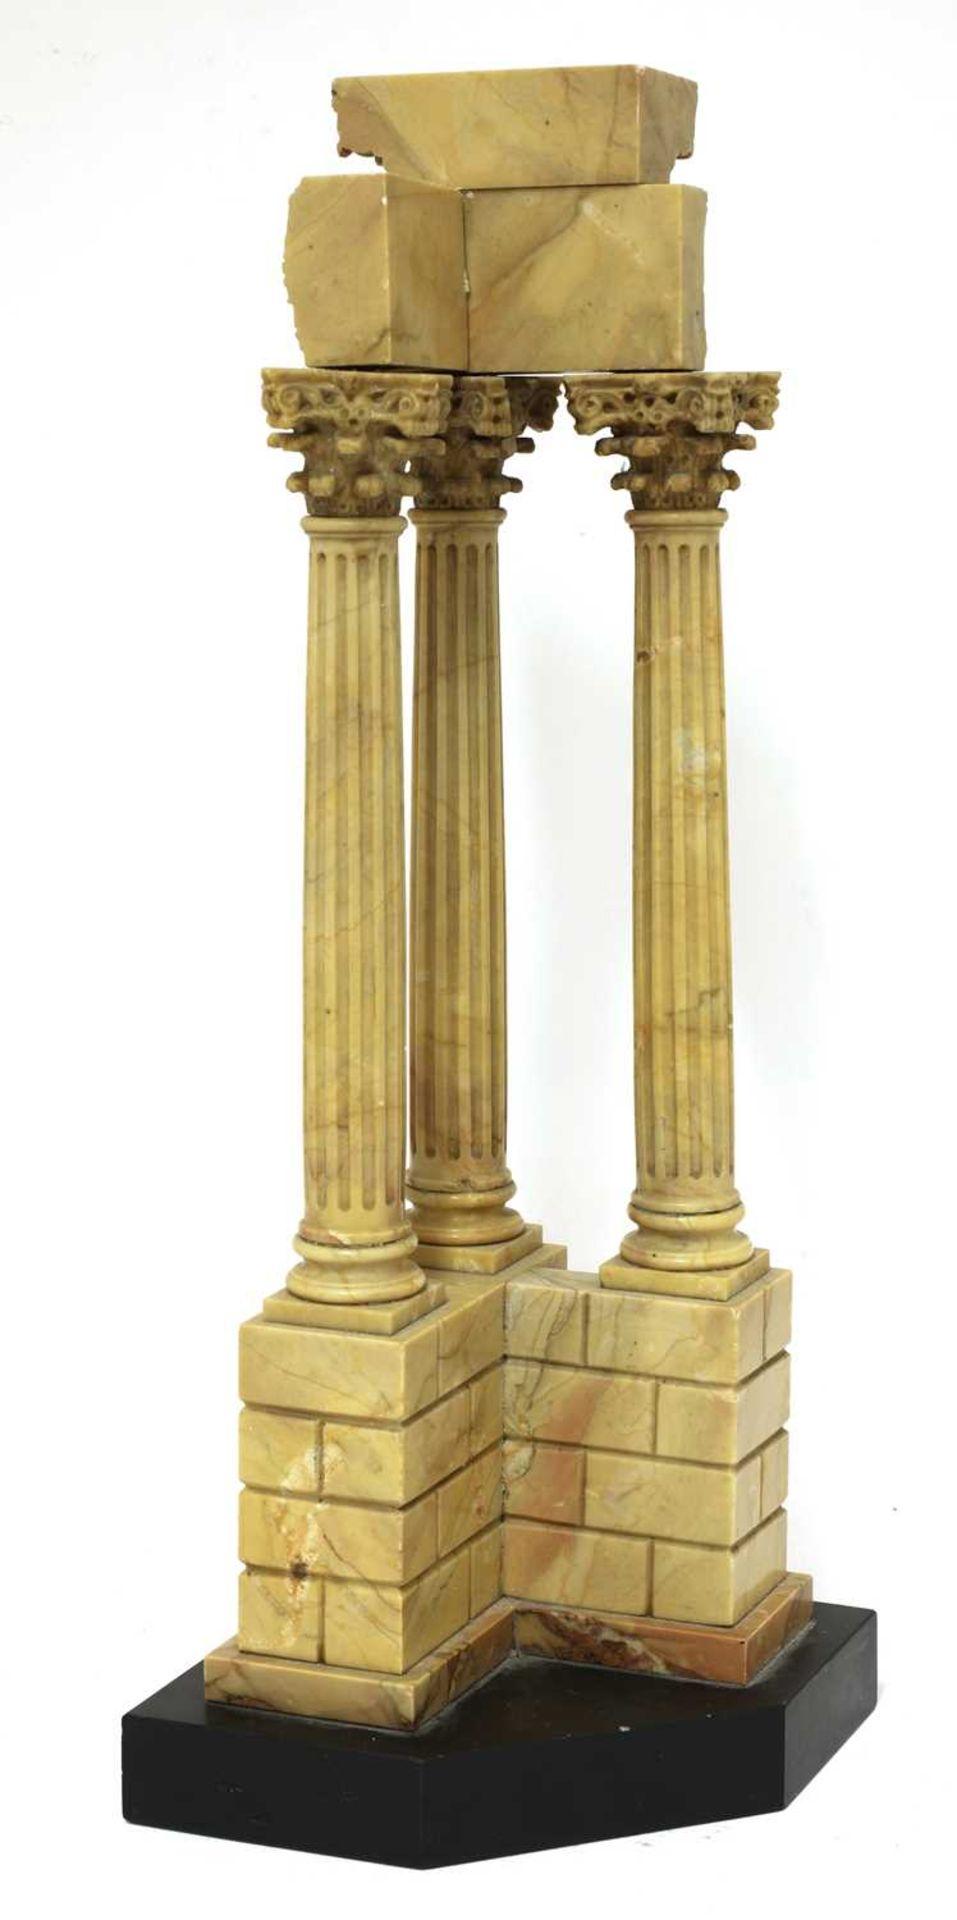 An Italian grand tour giallo antico marble souvenir, - Image 4 of 4